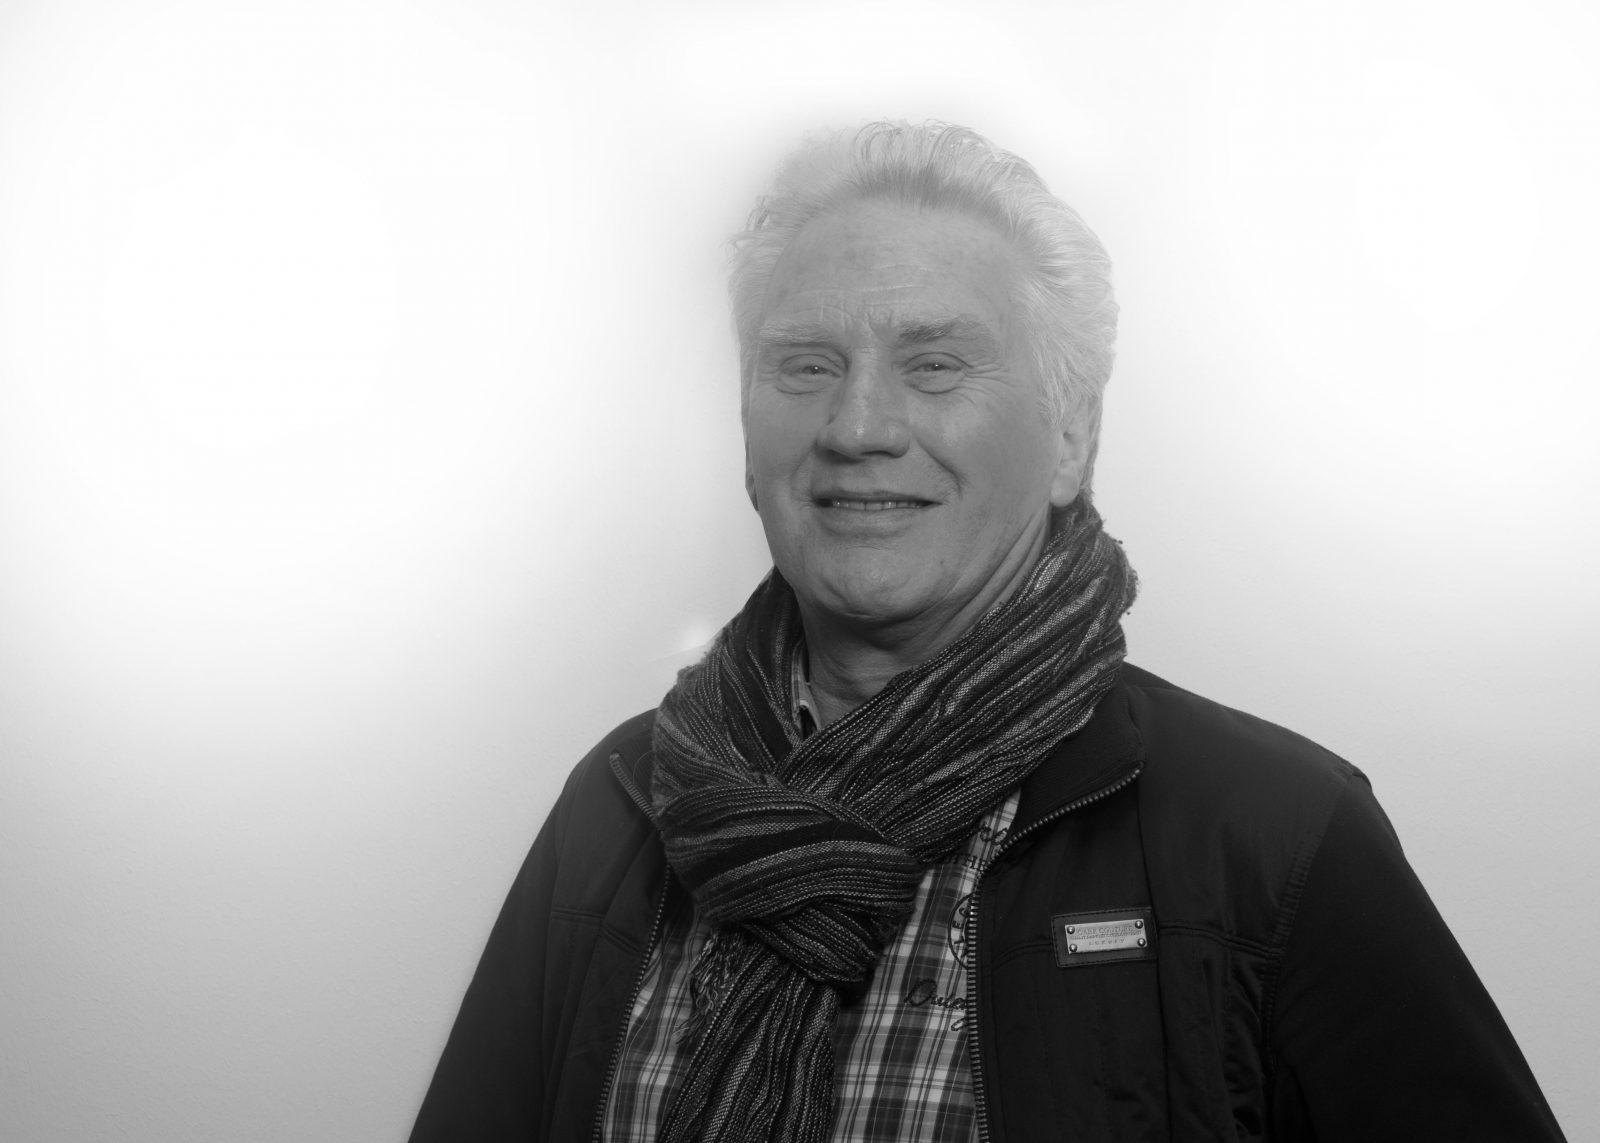 MOOI Noord-Holland burgerlid Johan Schuijt